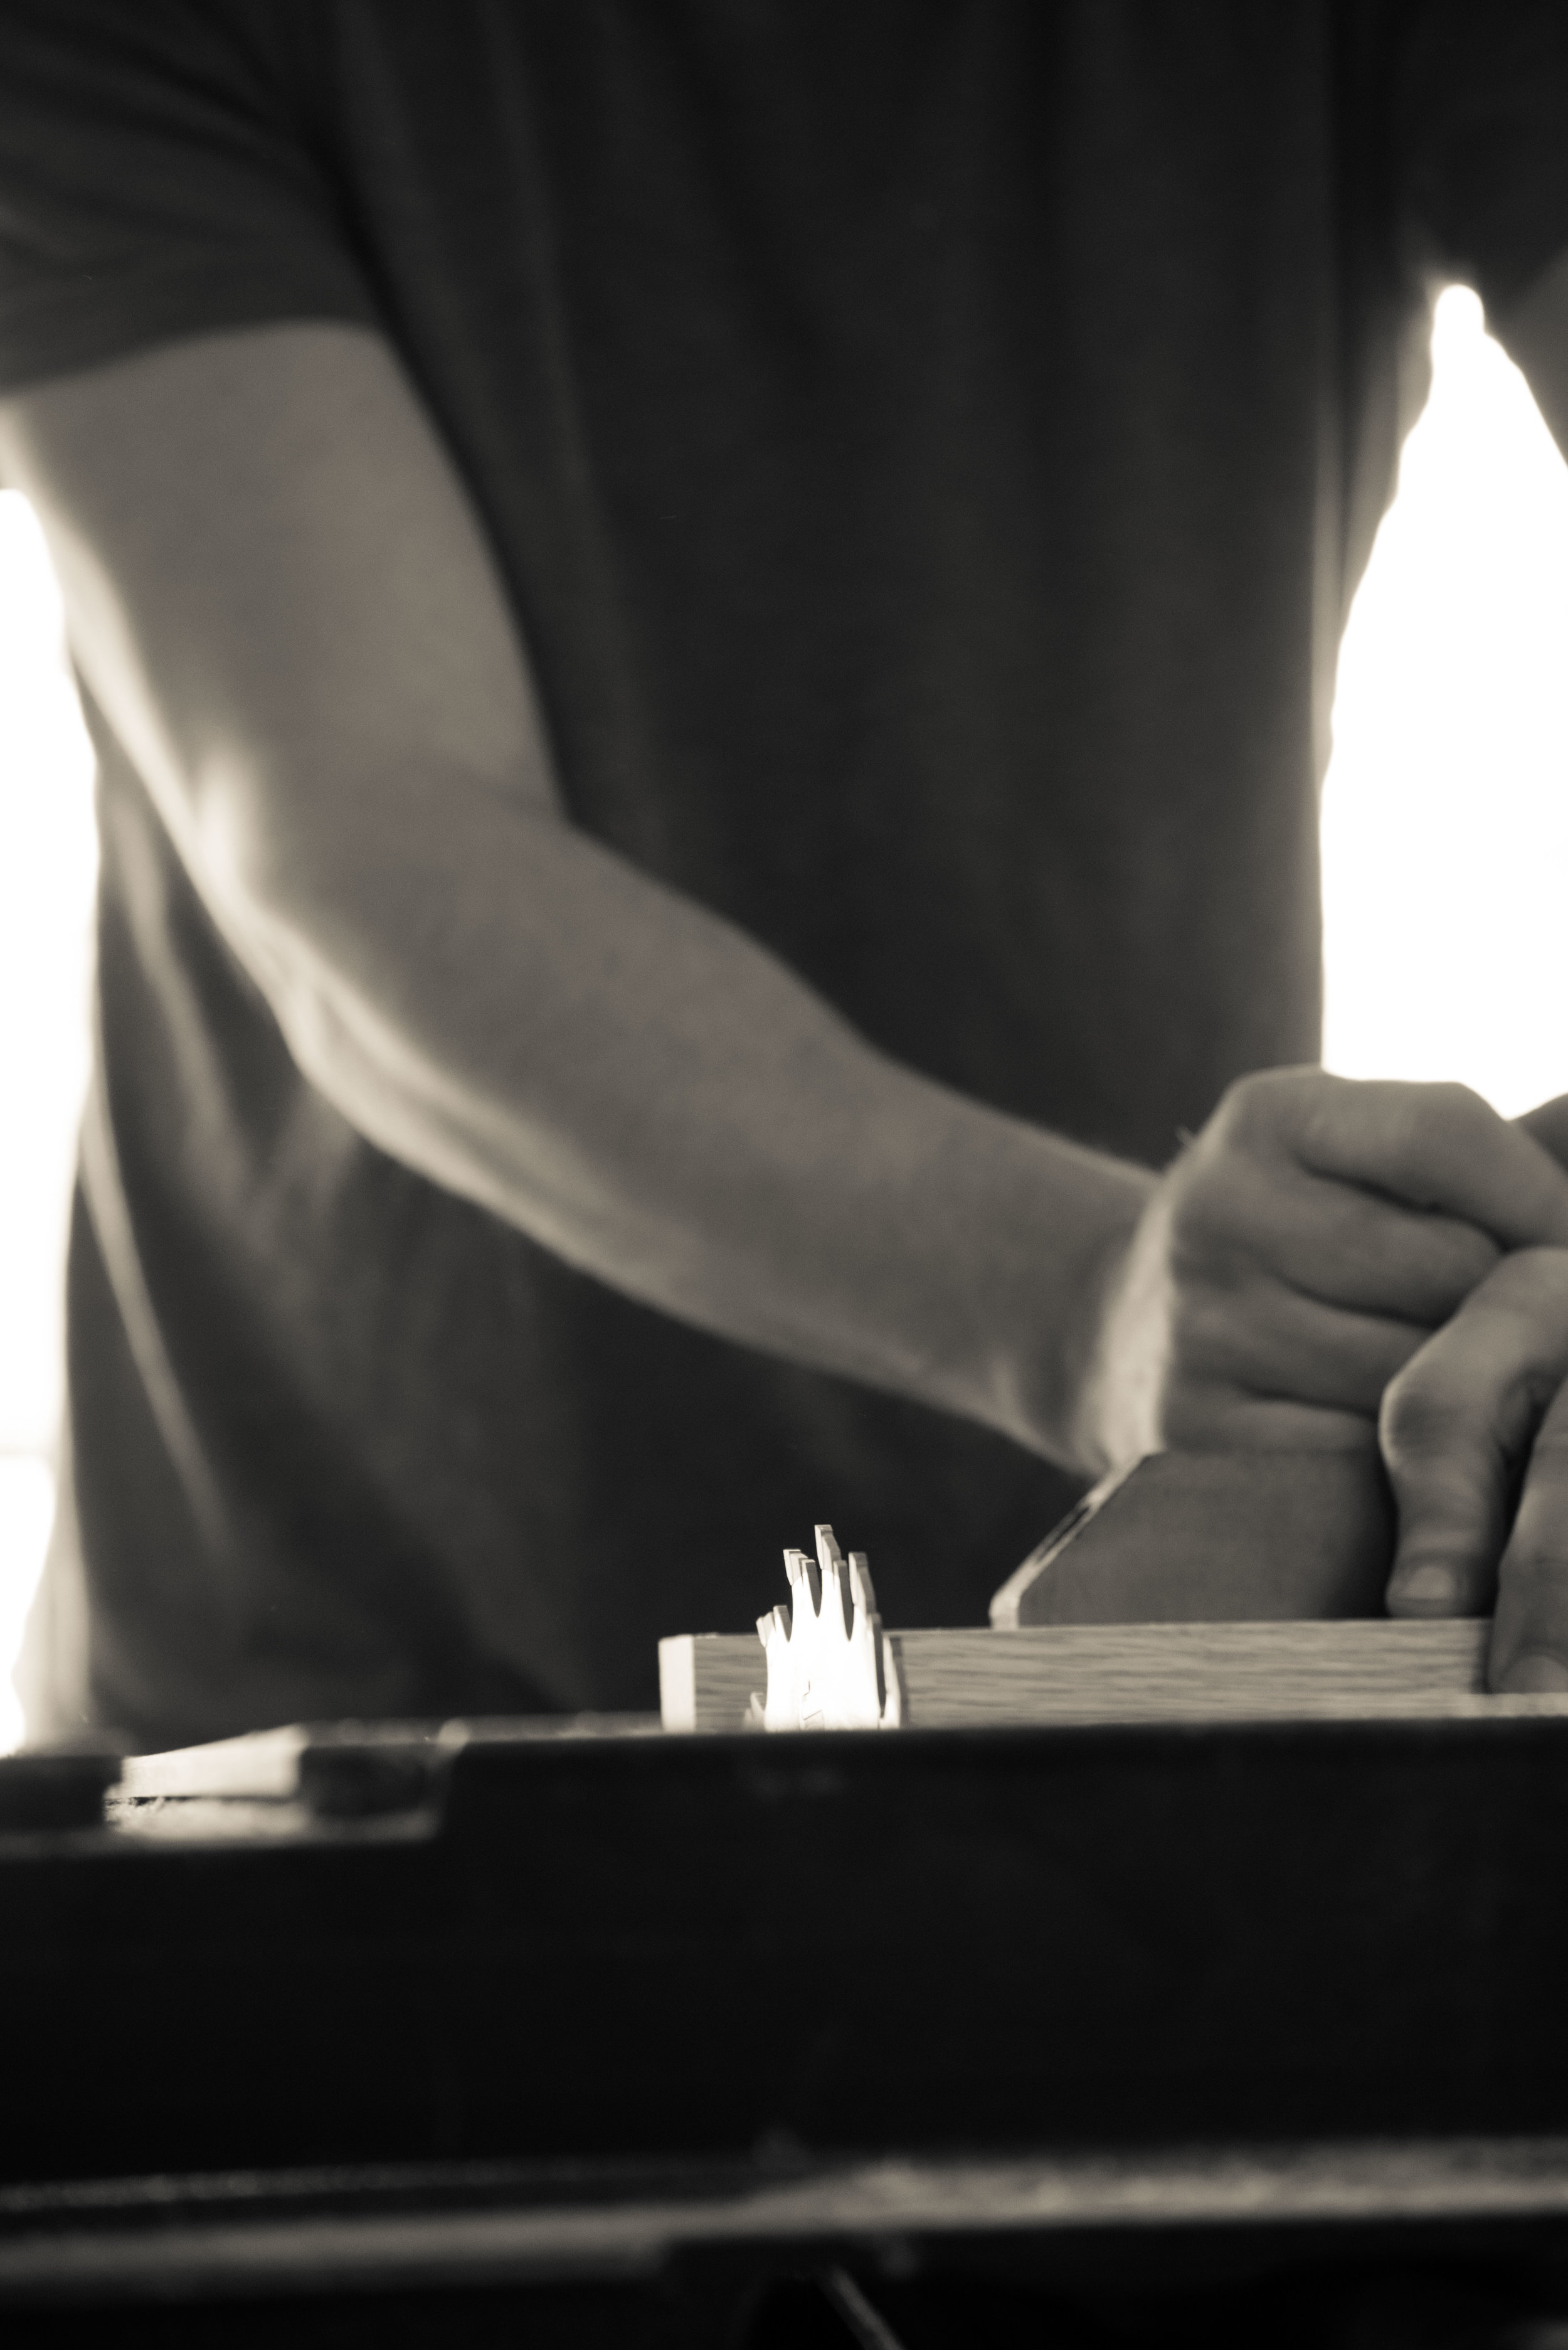 safe-table-saw-artistic-photo.jpg